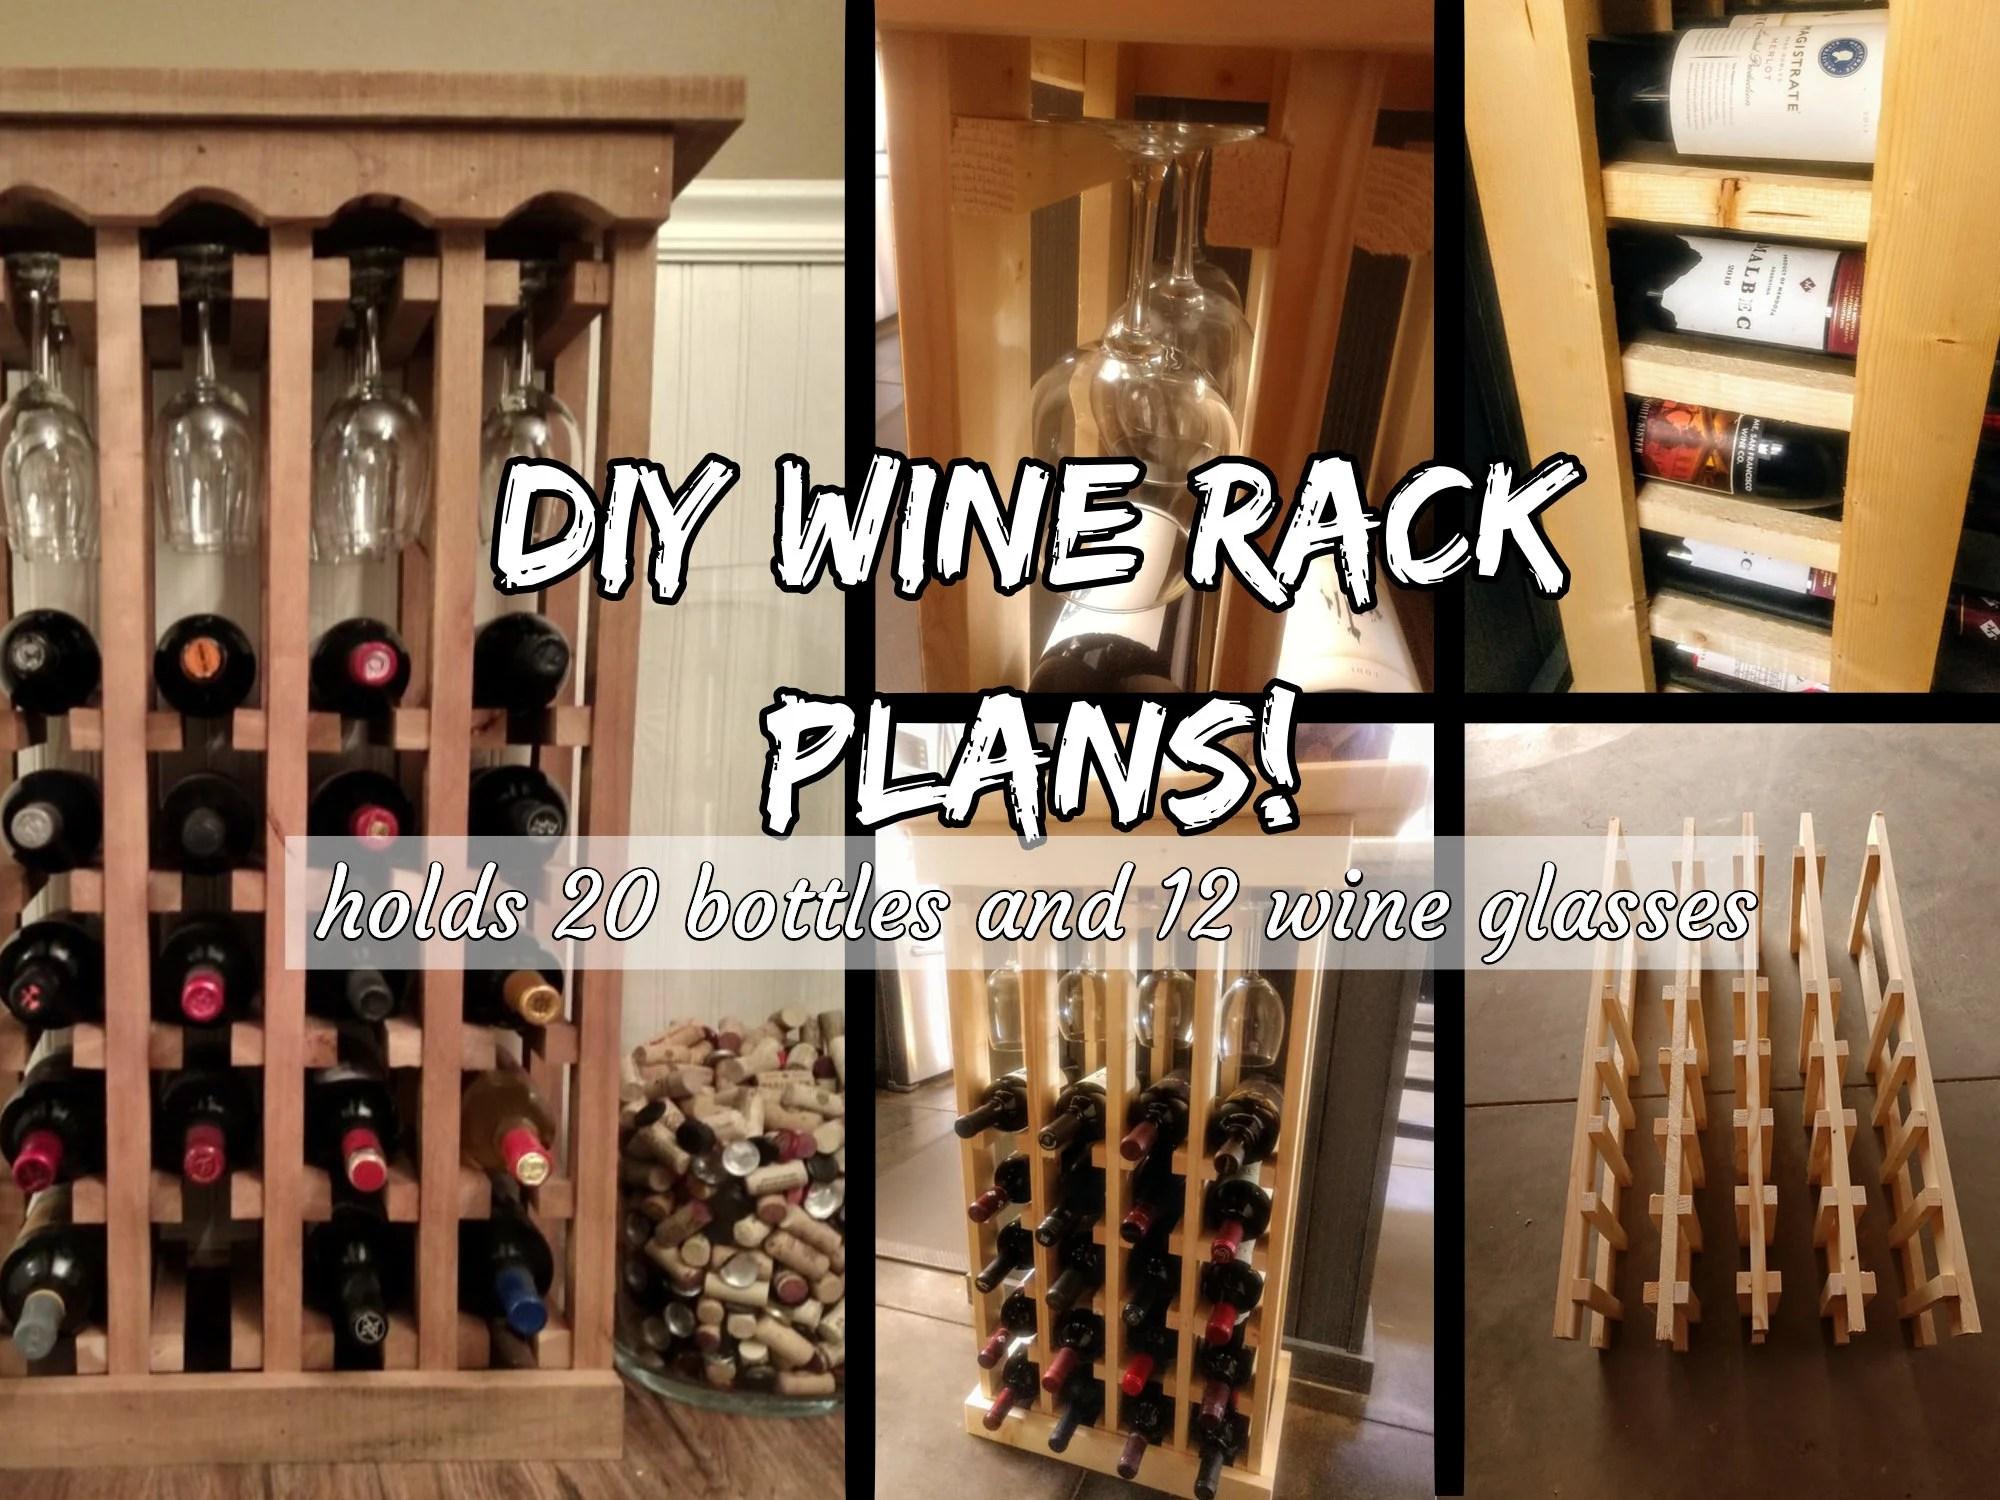 diy wine rack etsy